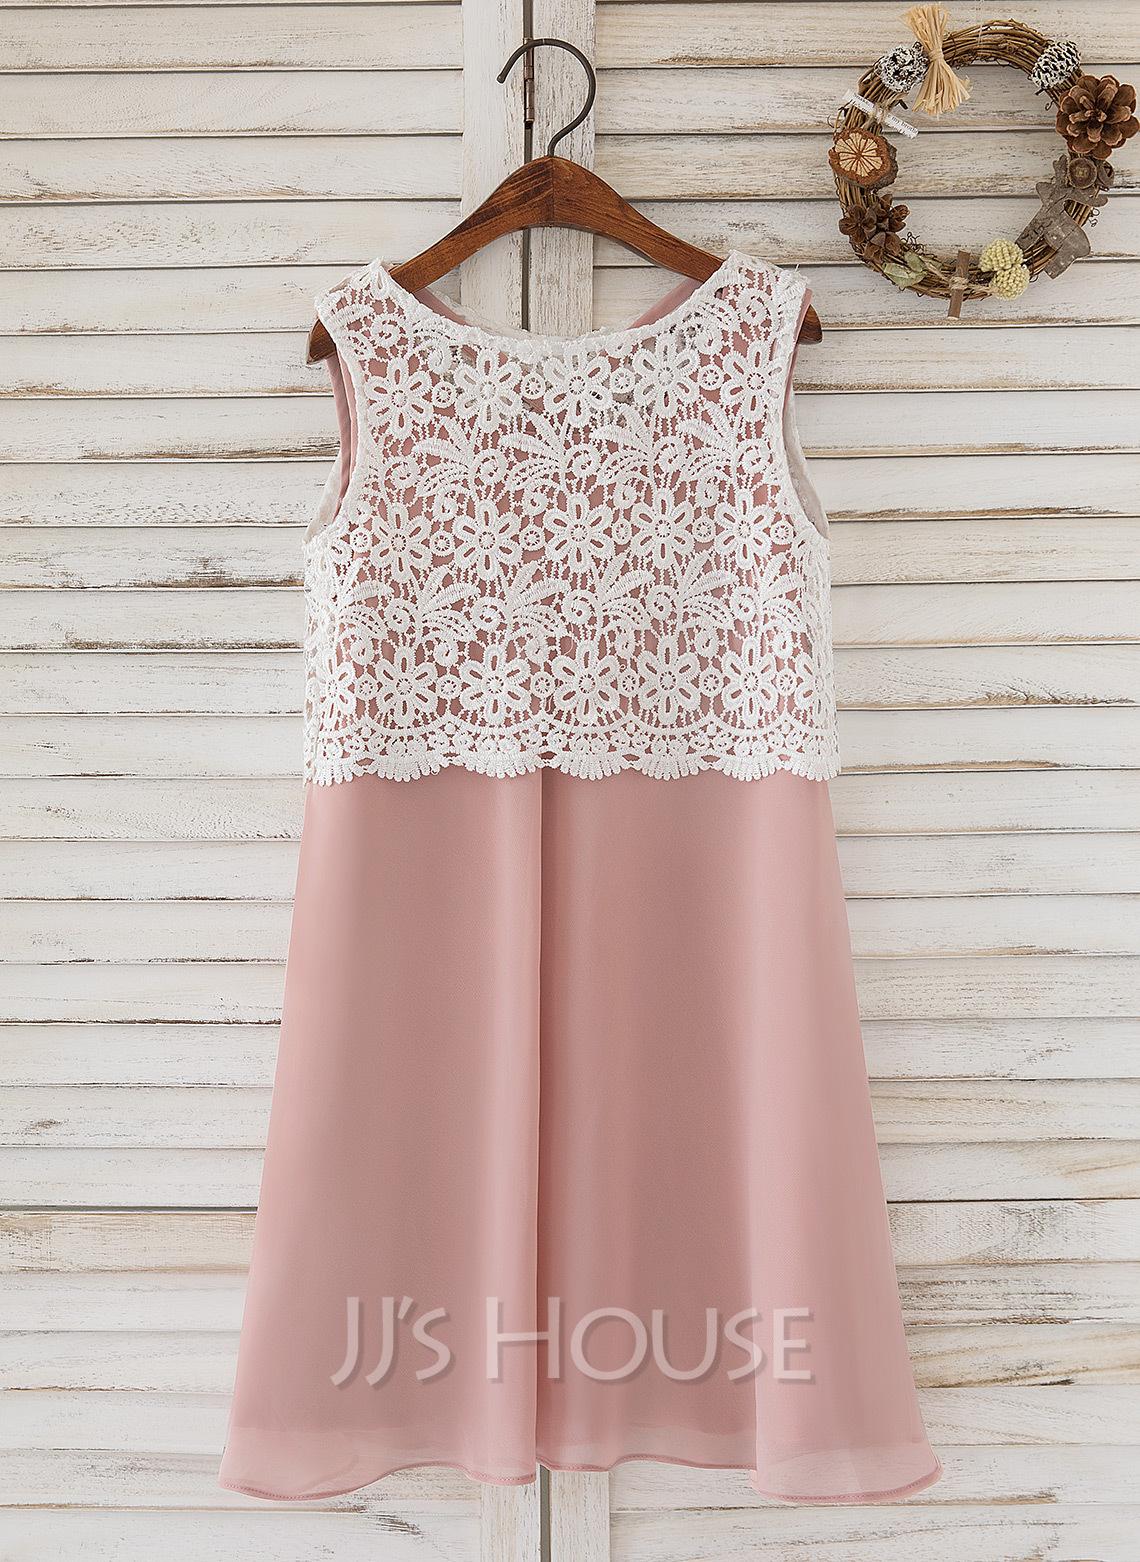 A-Line Knee-length Flower Girl Dress - Chiffon/Lace Sleeveless Scoop Neck